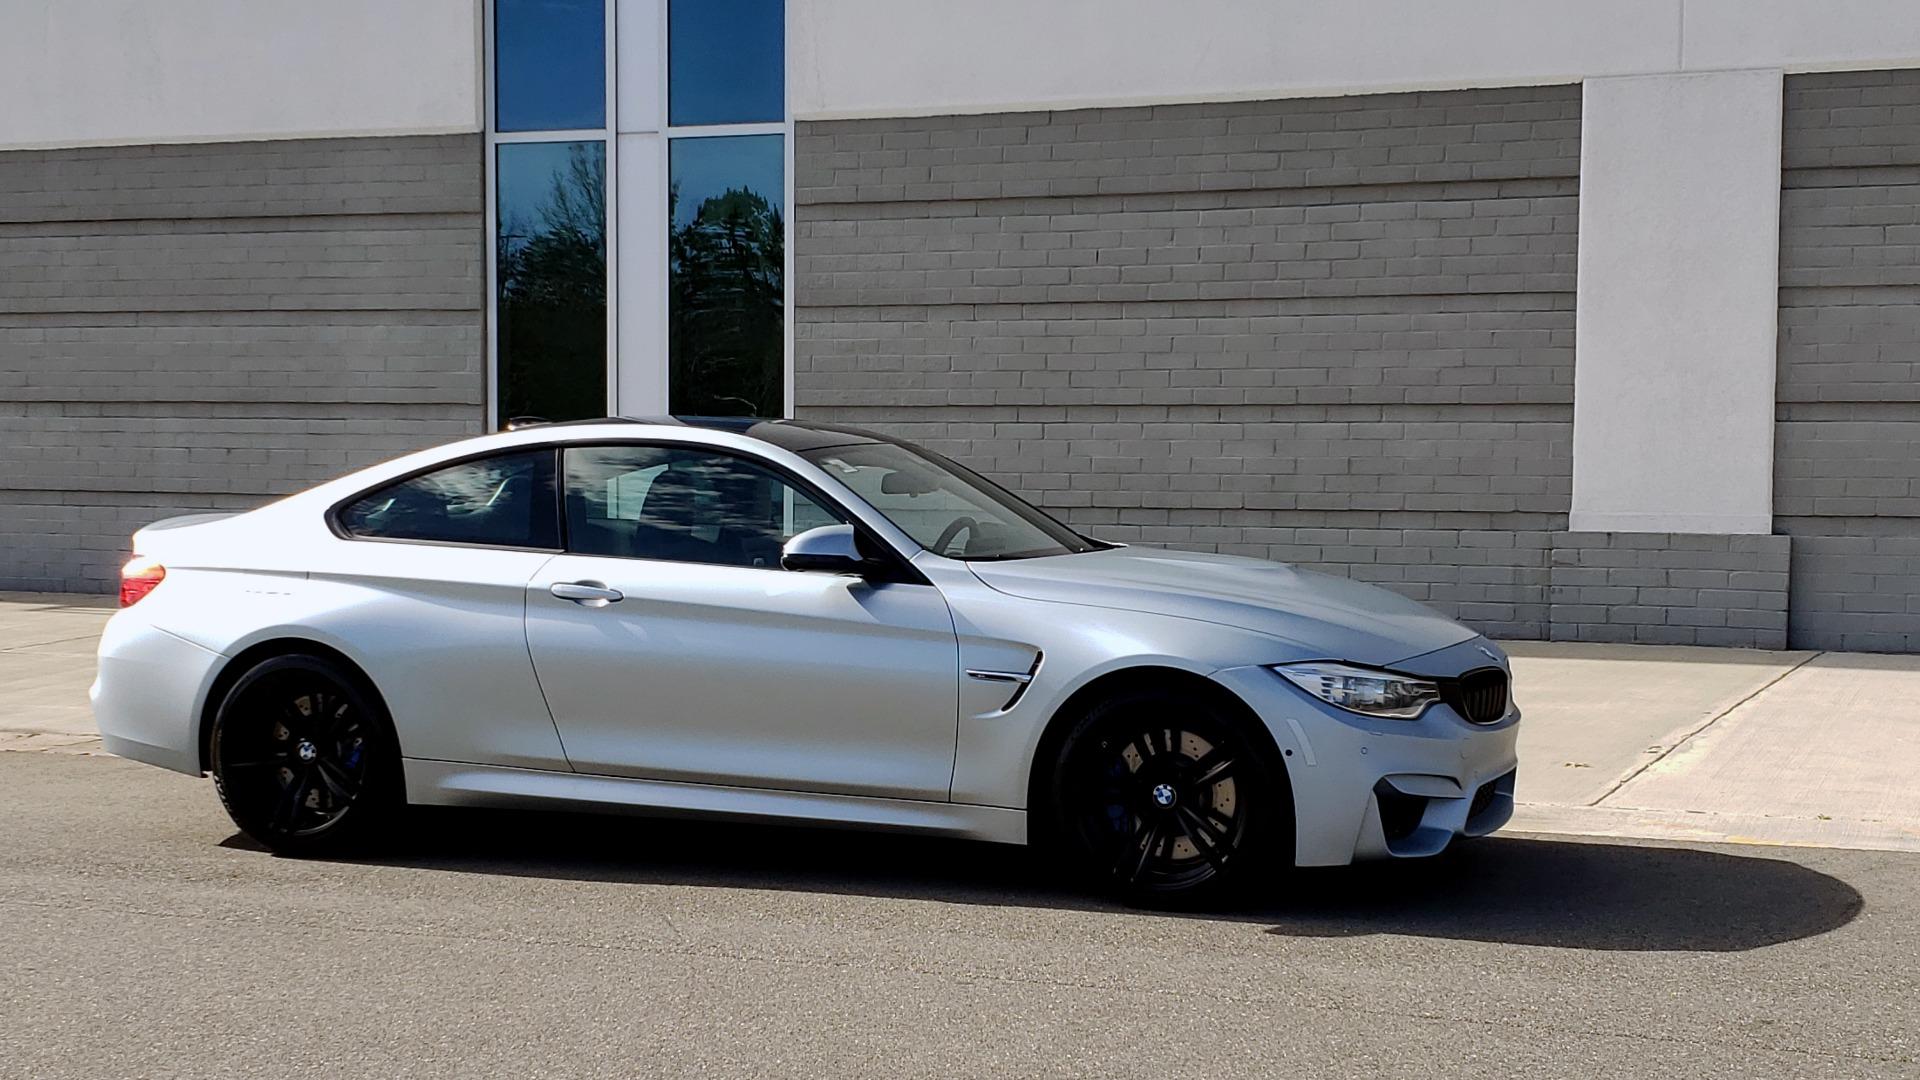 Used 2015 BMW M4 COUPE / EXEC PKG / DRVR ASST PLUS / LIGHTING / M-SUSPENSION for sale Sold at Formula Imports in Charlotte NC 28227 6